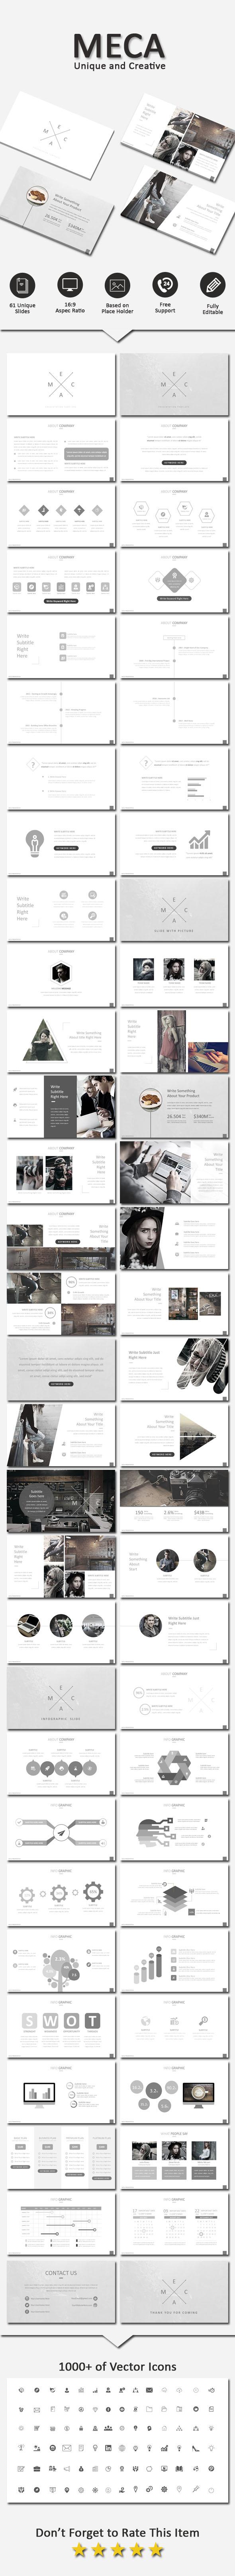 Meca Creative Powerpoint - Business PowerPoint Templates